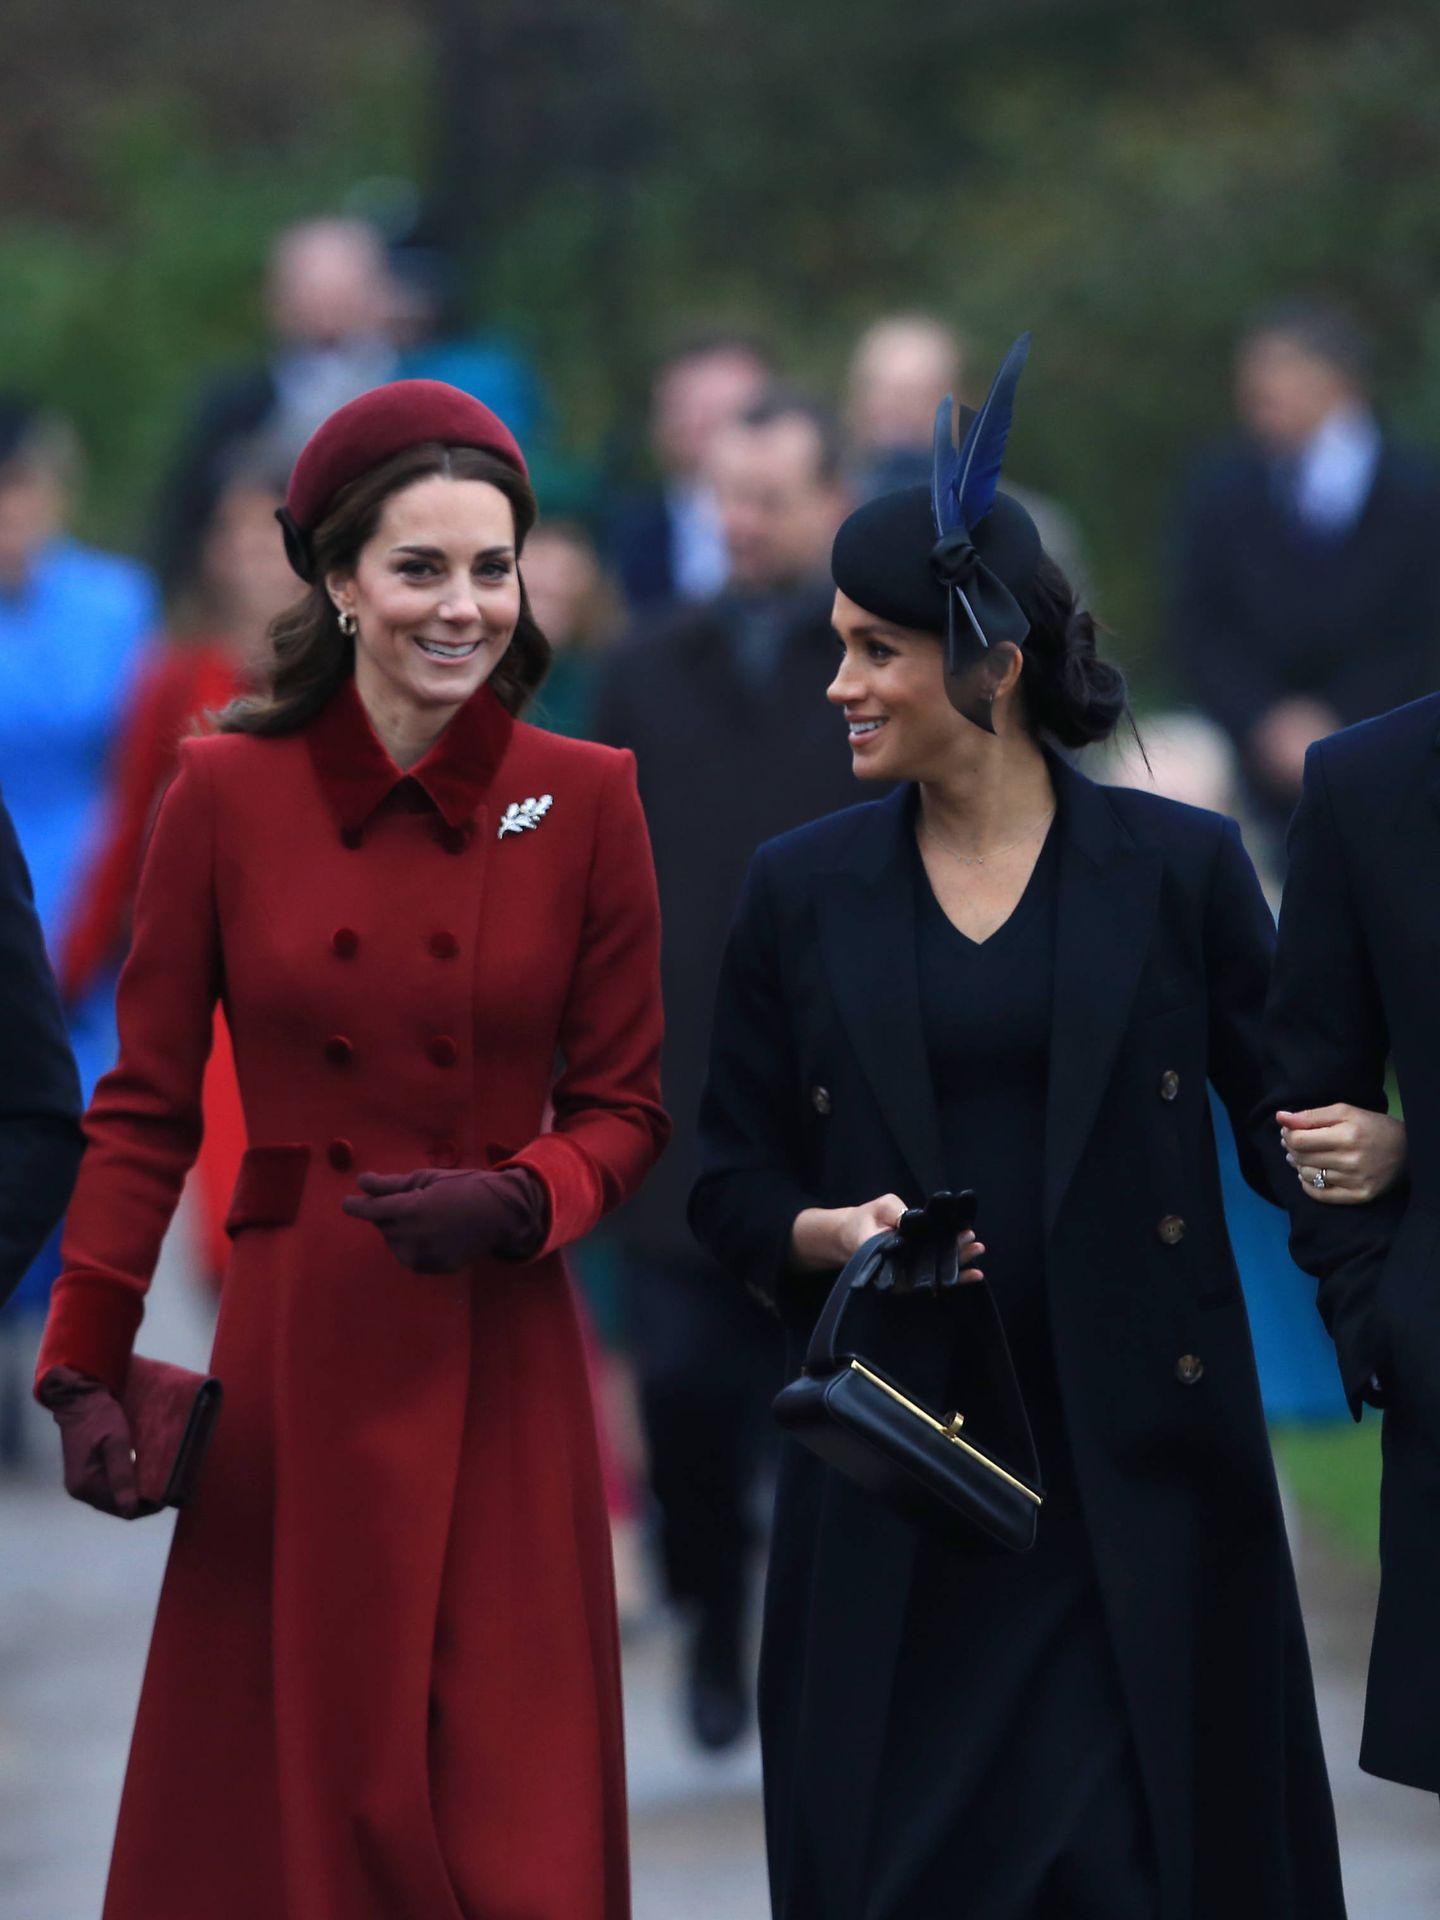 Meghan Markle y Kate Middleton, tras una misa de Navidad en Sandrigham. (Getty)